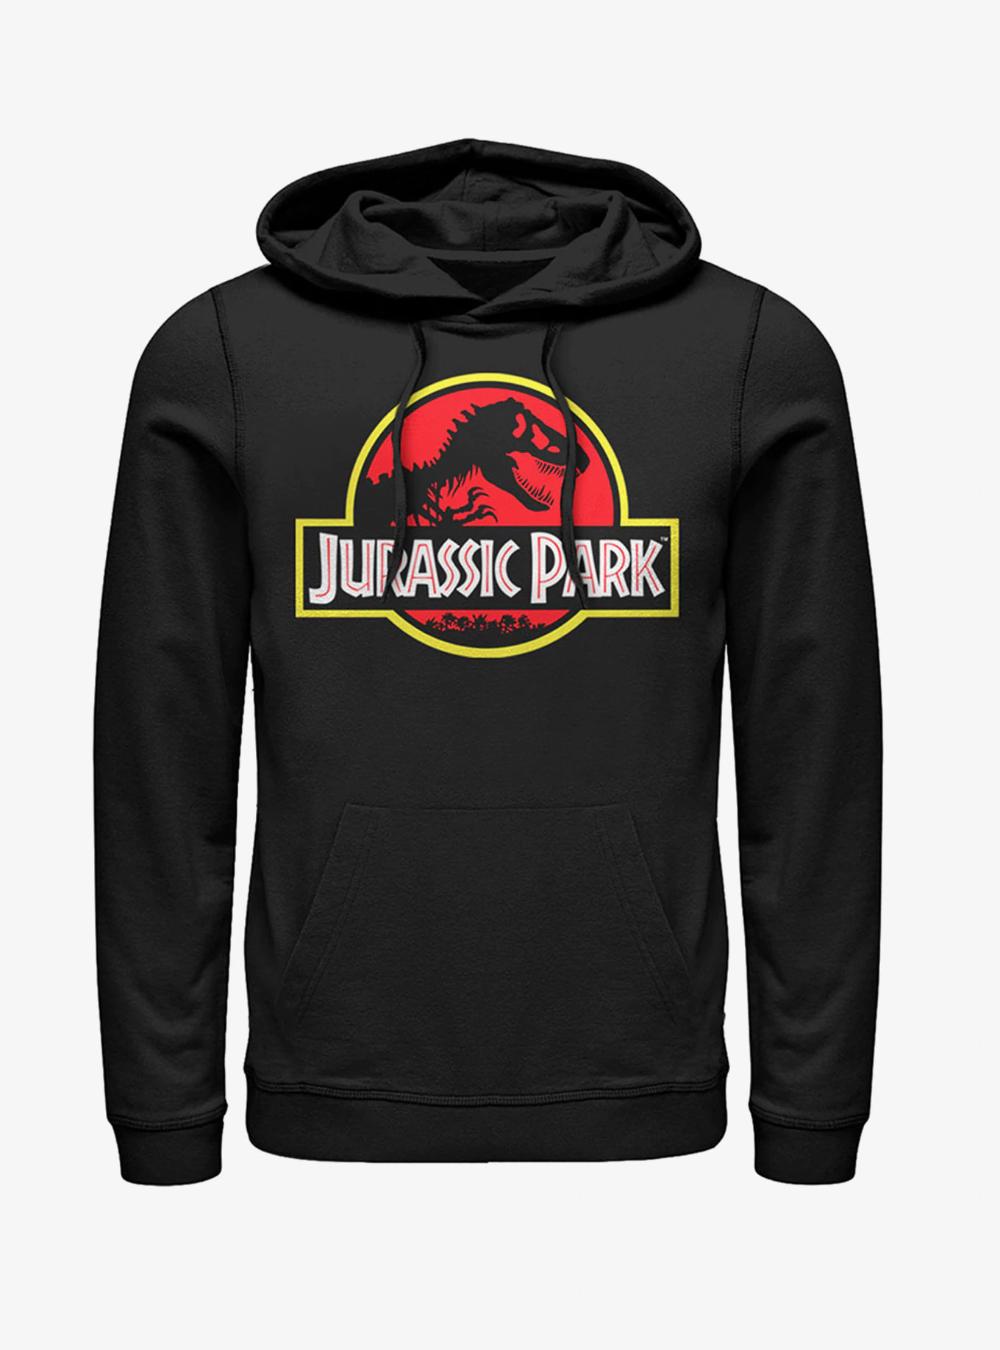 Jurassic Park Bold Classic Logo Hoodie Hoodies, Sunset